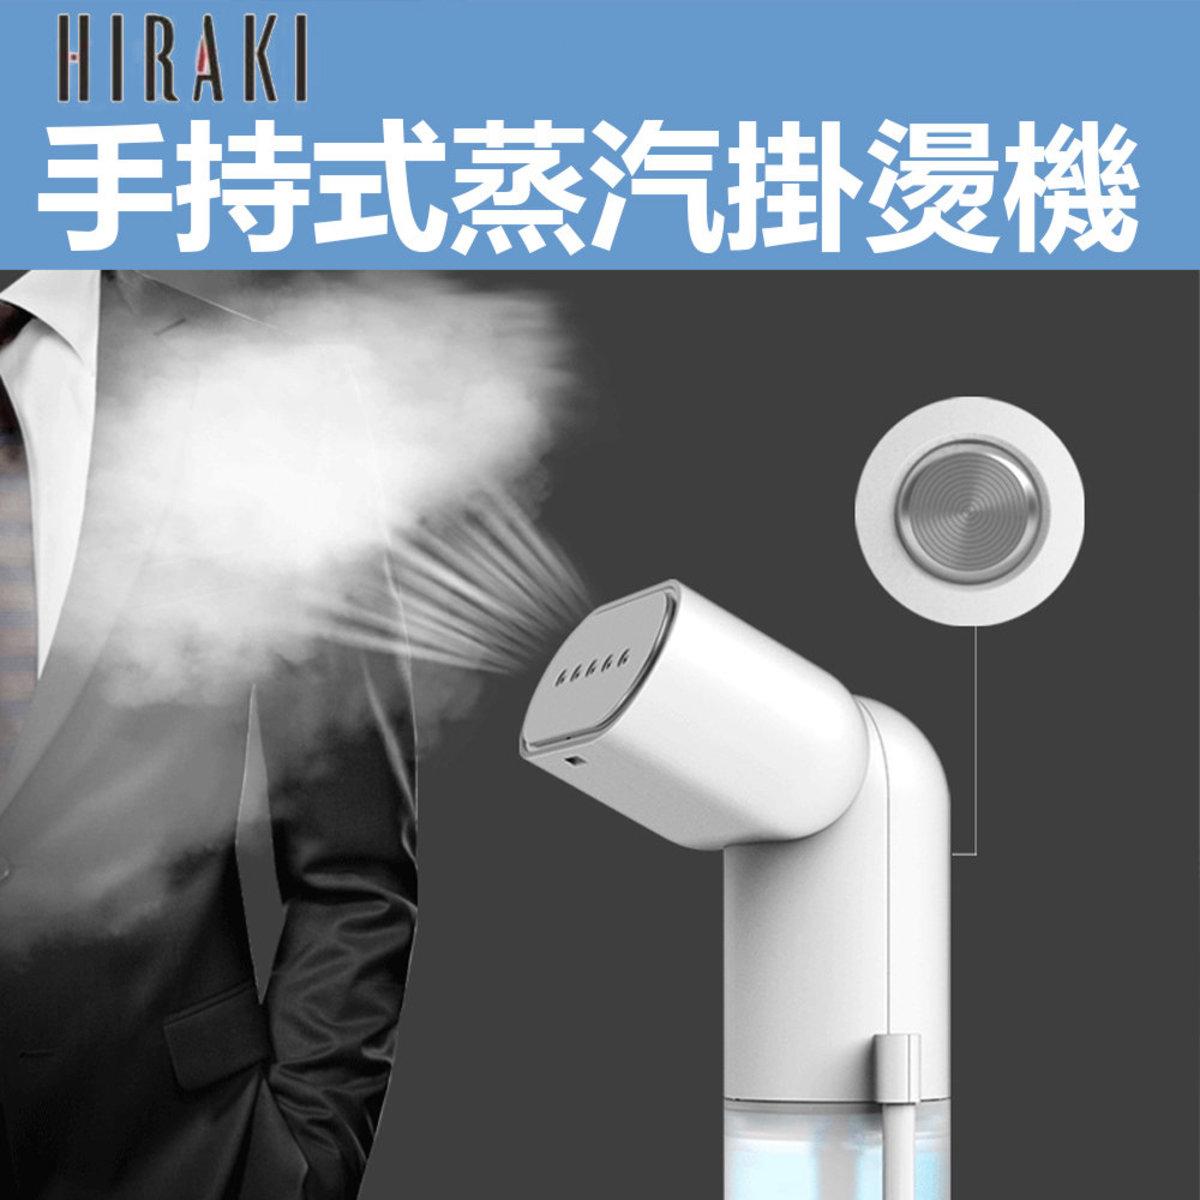 Handheld garment steamer - HI-001